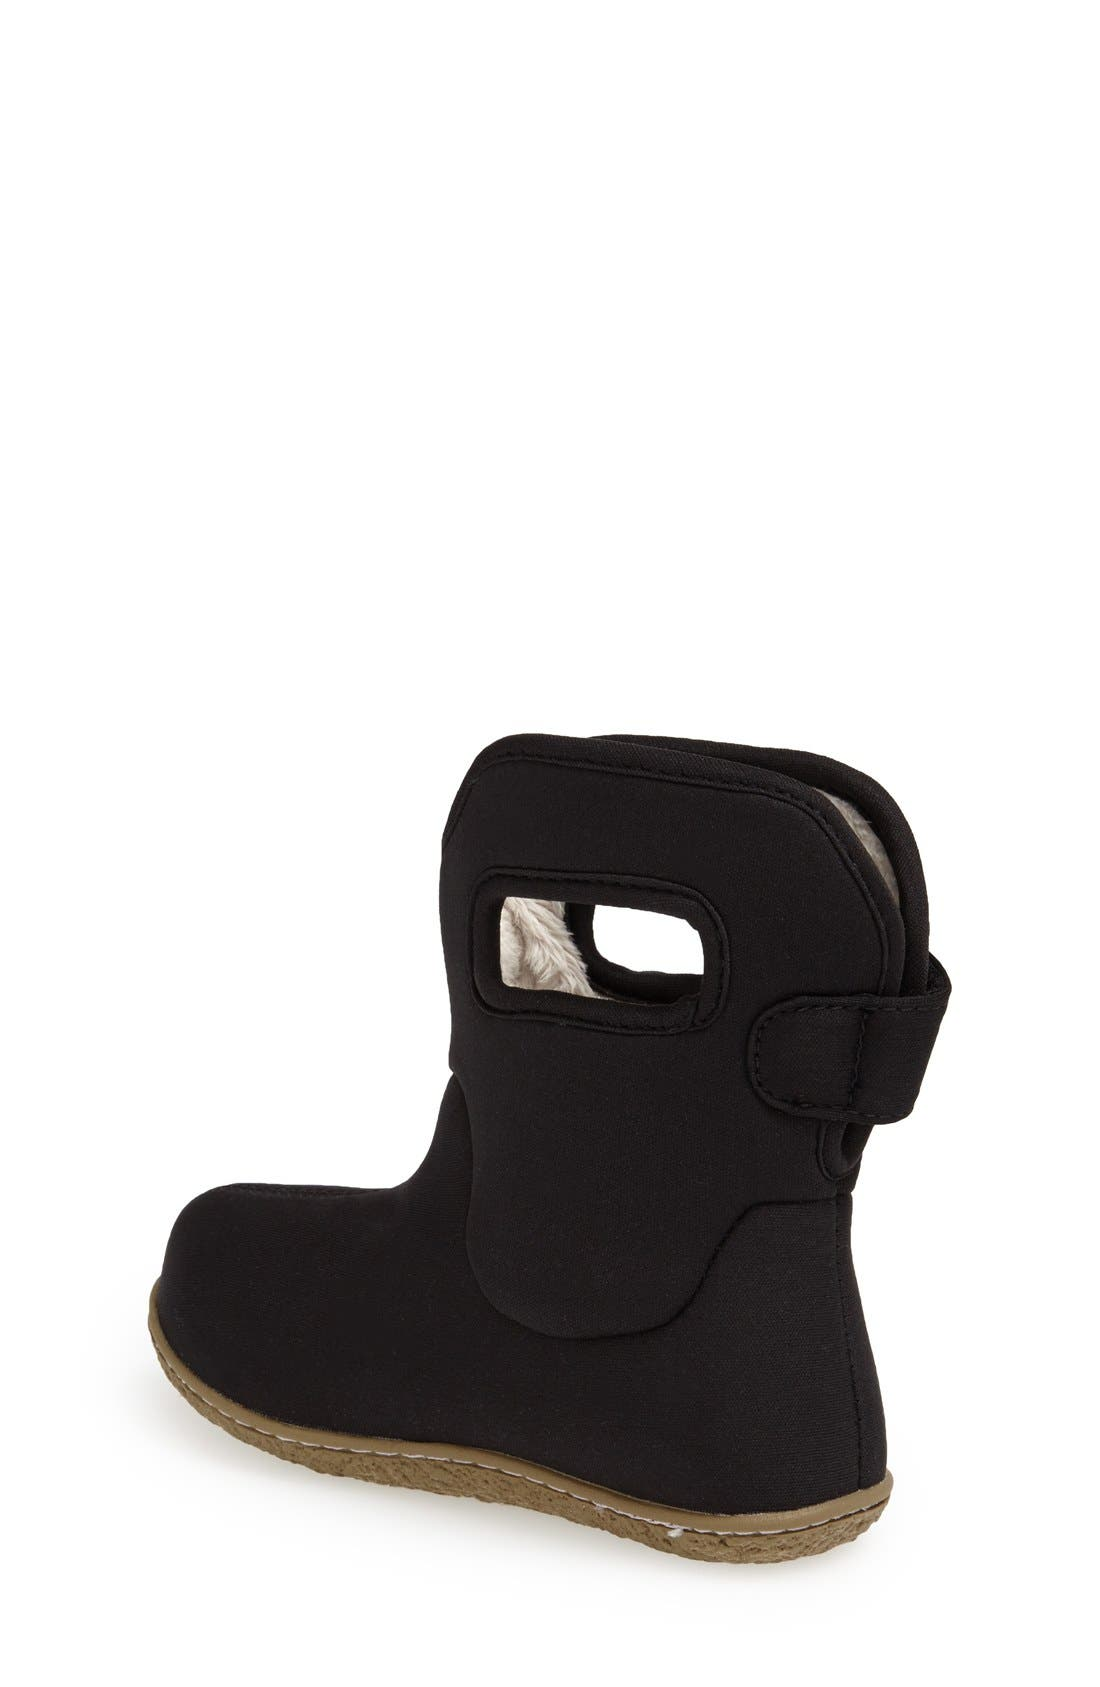 BOGS,                             Baby Bogs Insulated Waterproof Rain Boot,                             Alternate thumbnail 2, color,                             BLACK